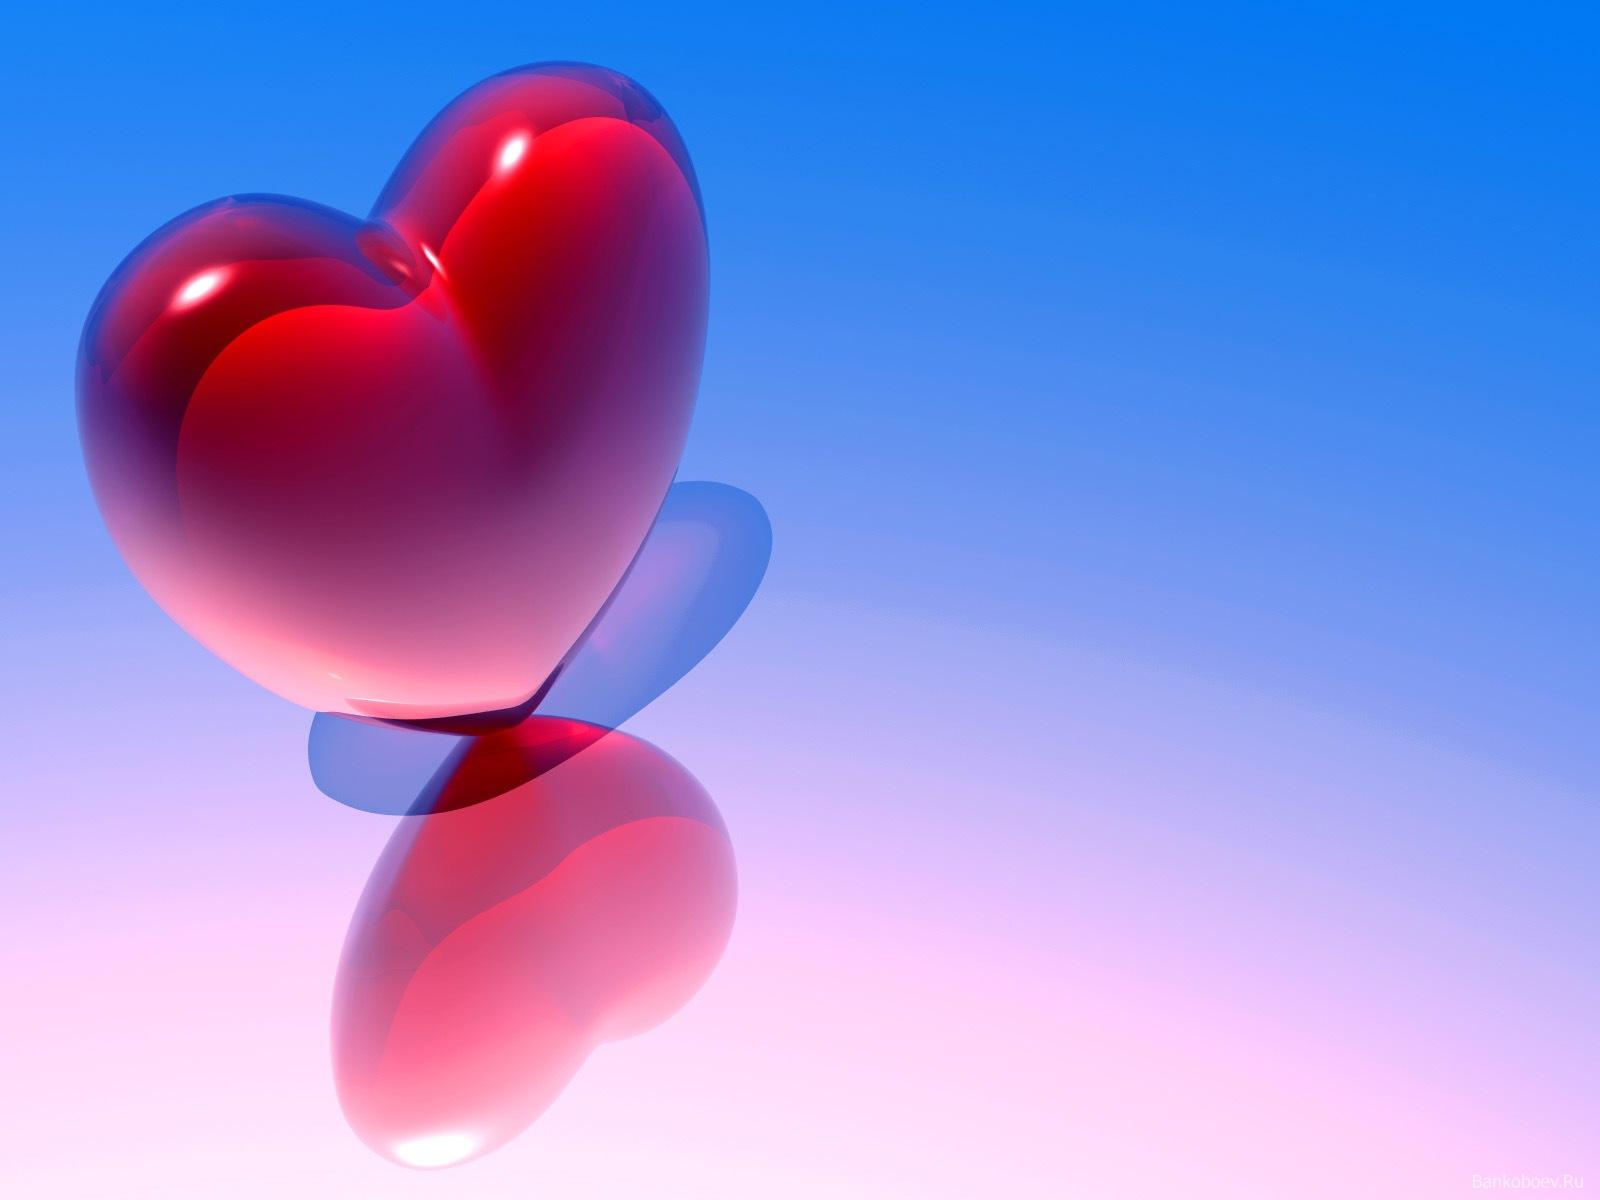 صور شعر رومانسي 2017 ,صور شعر حب 2018 , عبارات رومانسية, , رومانسي , رومانسية , عبارات صور شعر رومان 2015_1418574531_277.